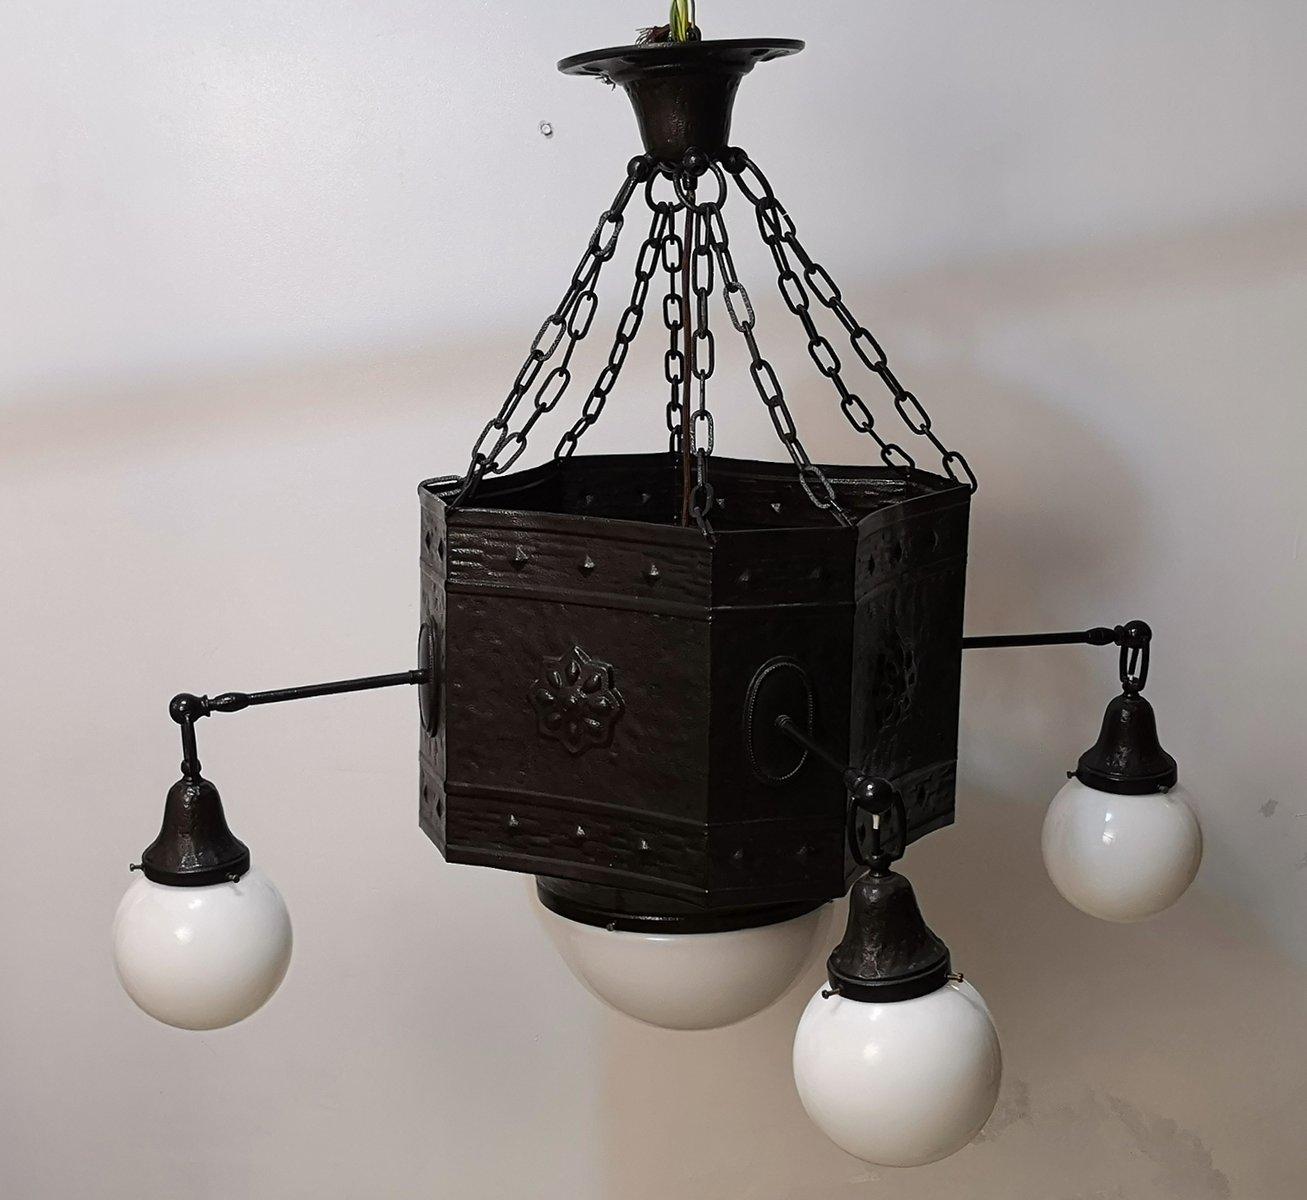 Große antike Deckenlampe